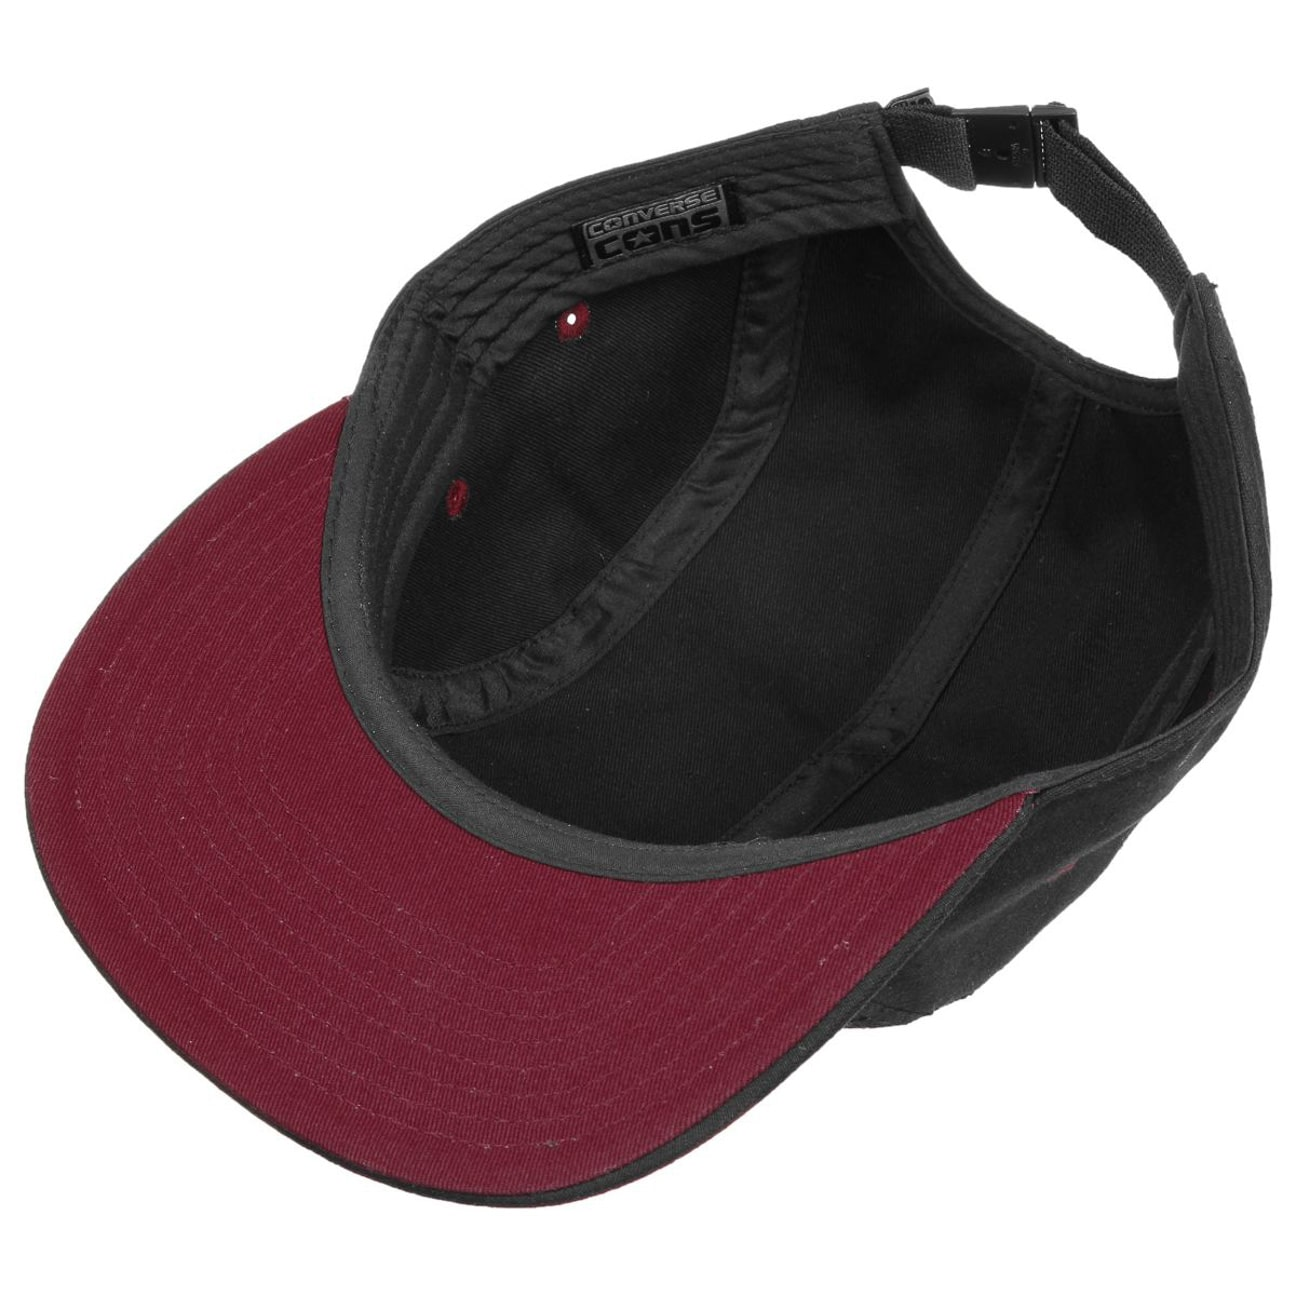 converse 5 panel hat